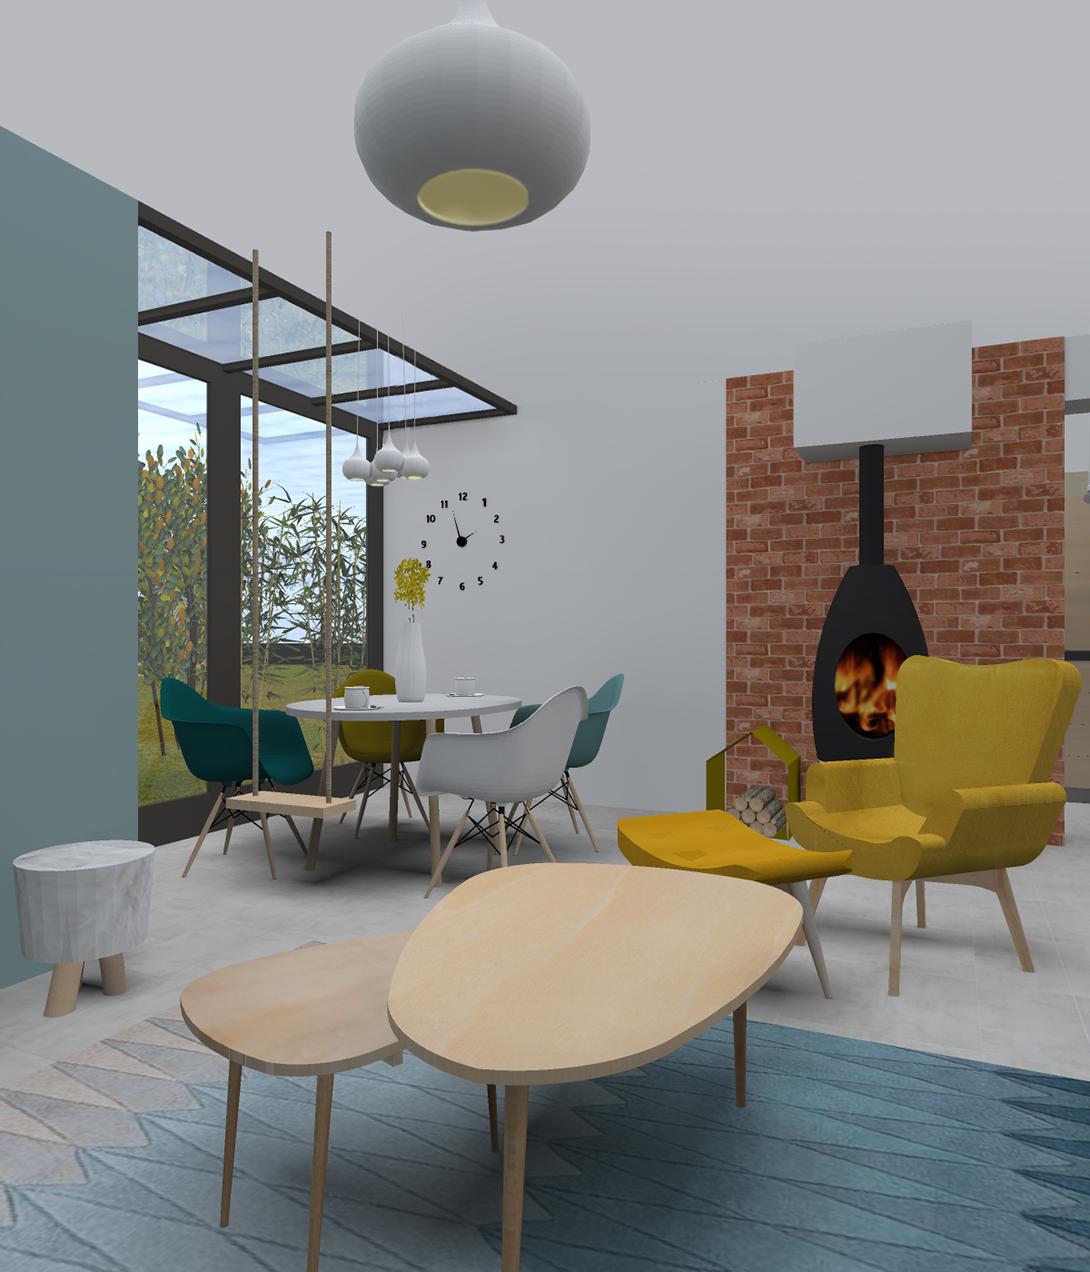 agence sk a tiphaine thomas design d 39 espace architecture d 39 int rieur. Black Bedroom Furniture Sets. Home Design Ideas